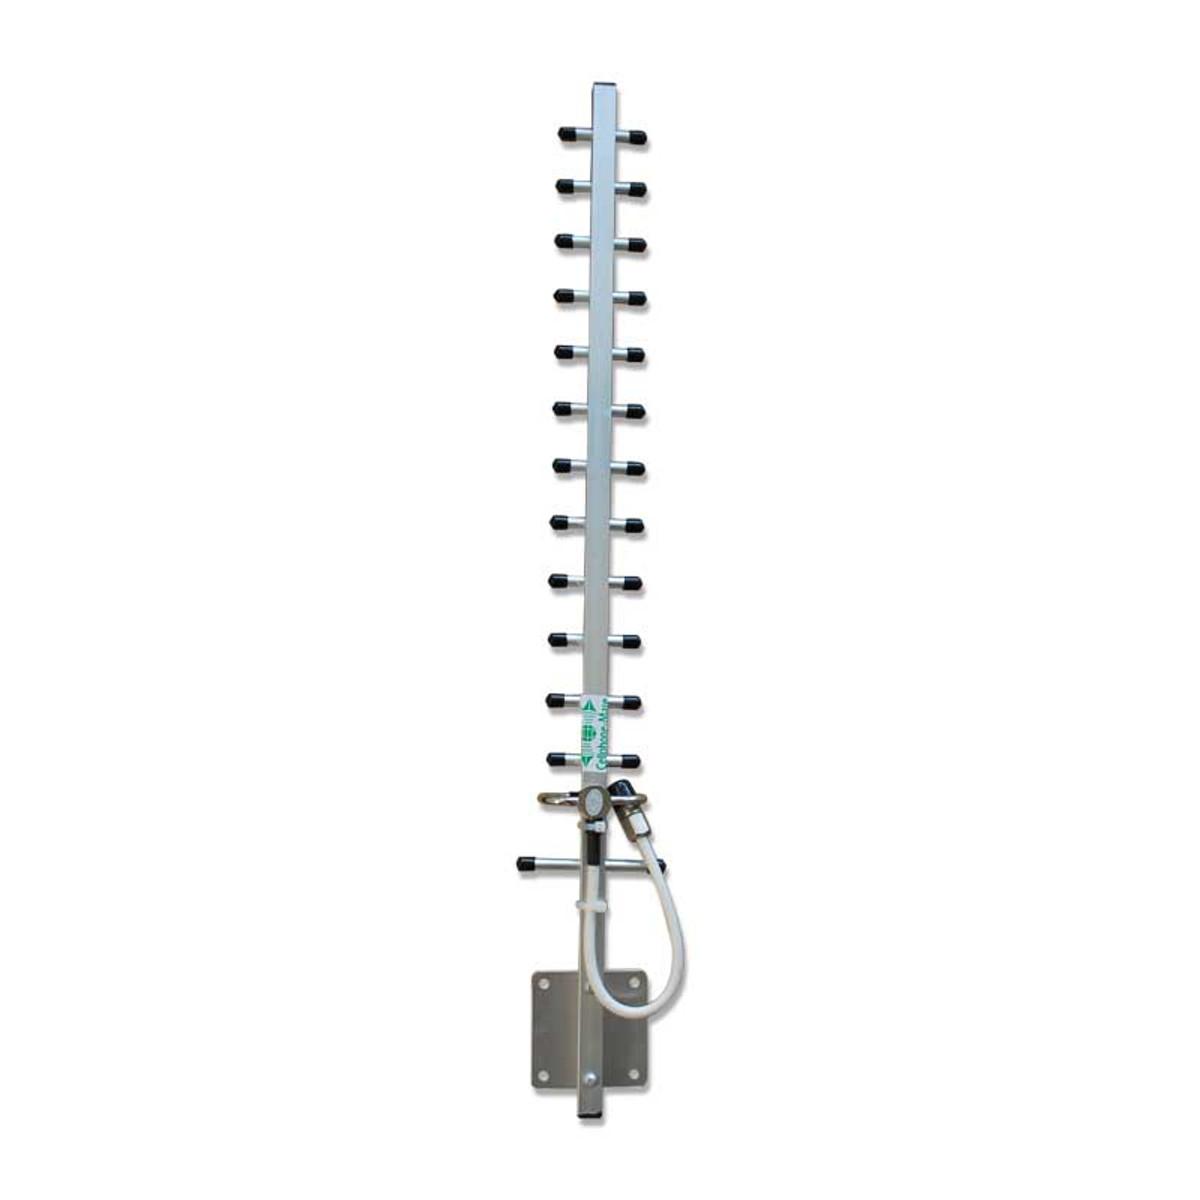 SureCall 800 MHz Yagi Antenna   SC-230-800